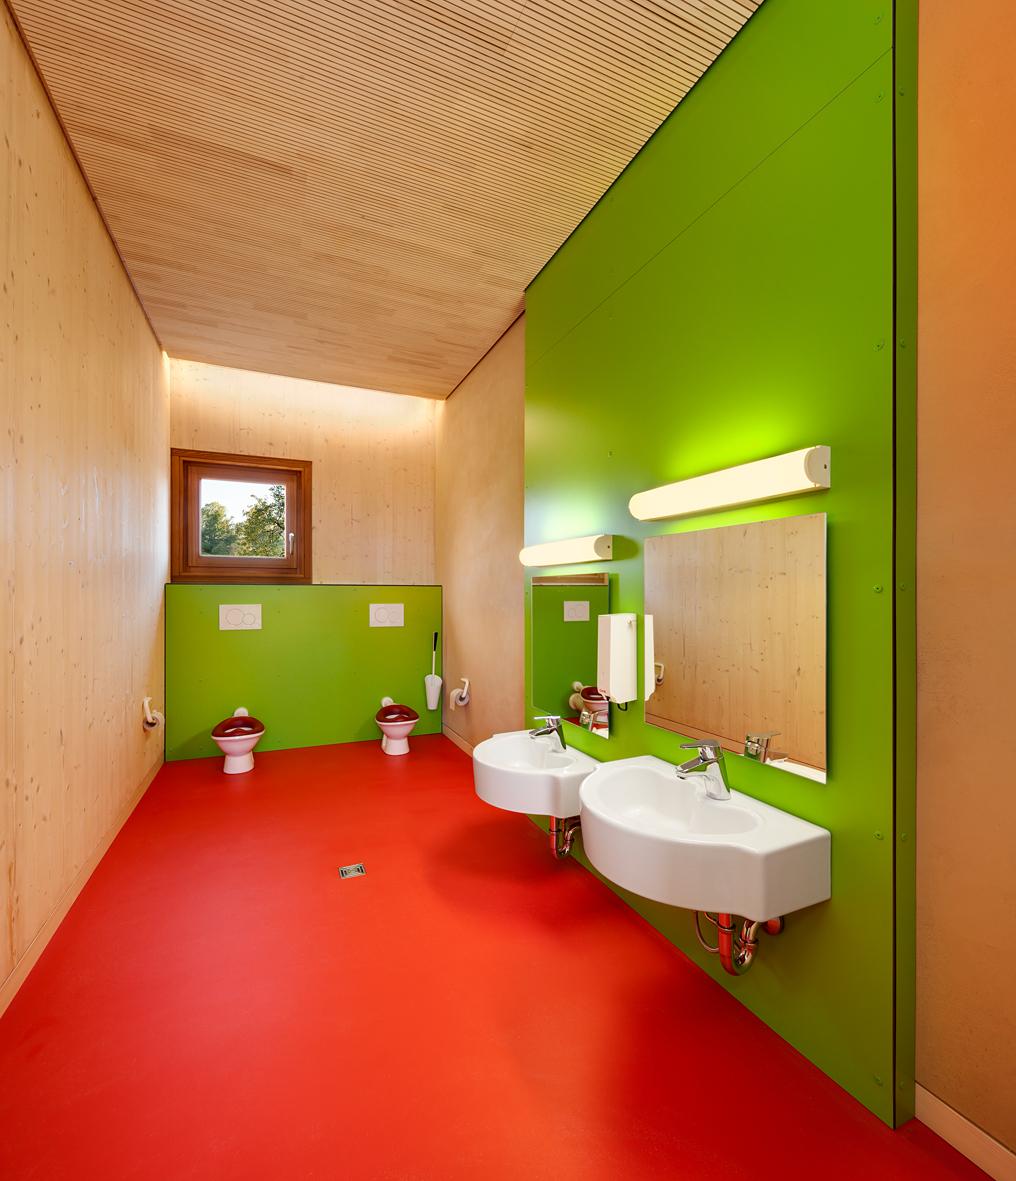 Gallery of kinderkrippe pollenfeld k hnlein architektur 2 for Bathroom design courses